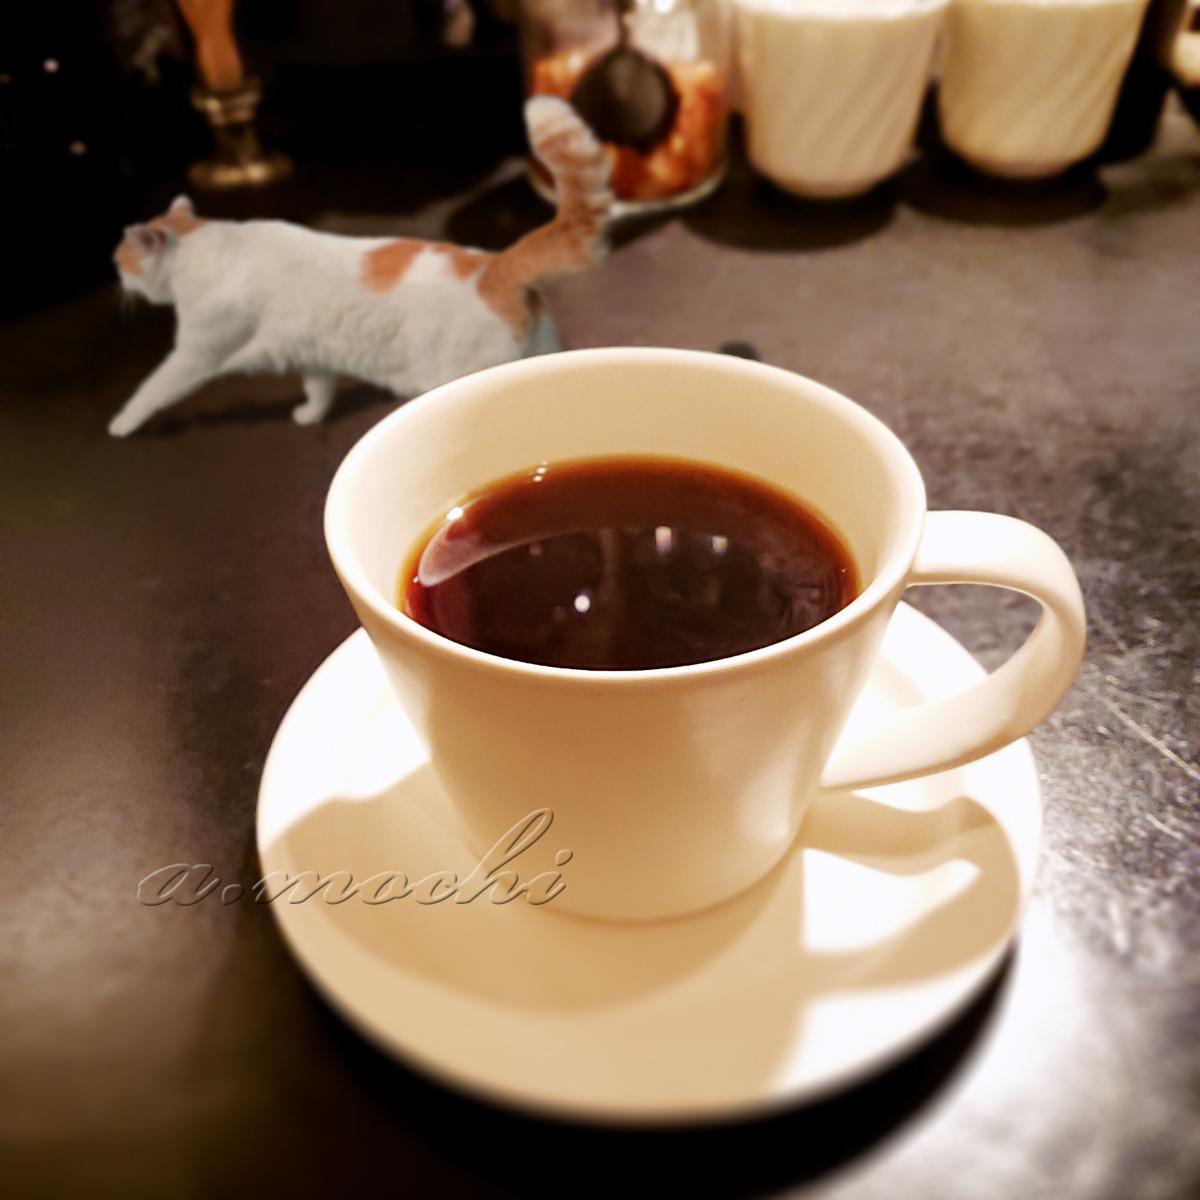 magnoria_coffee.jpg